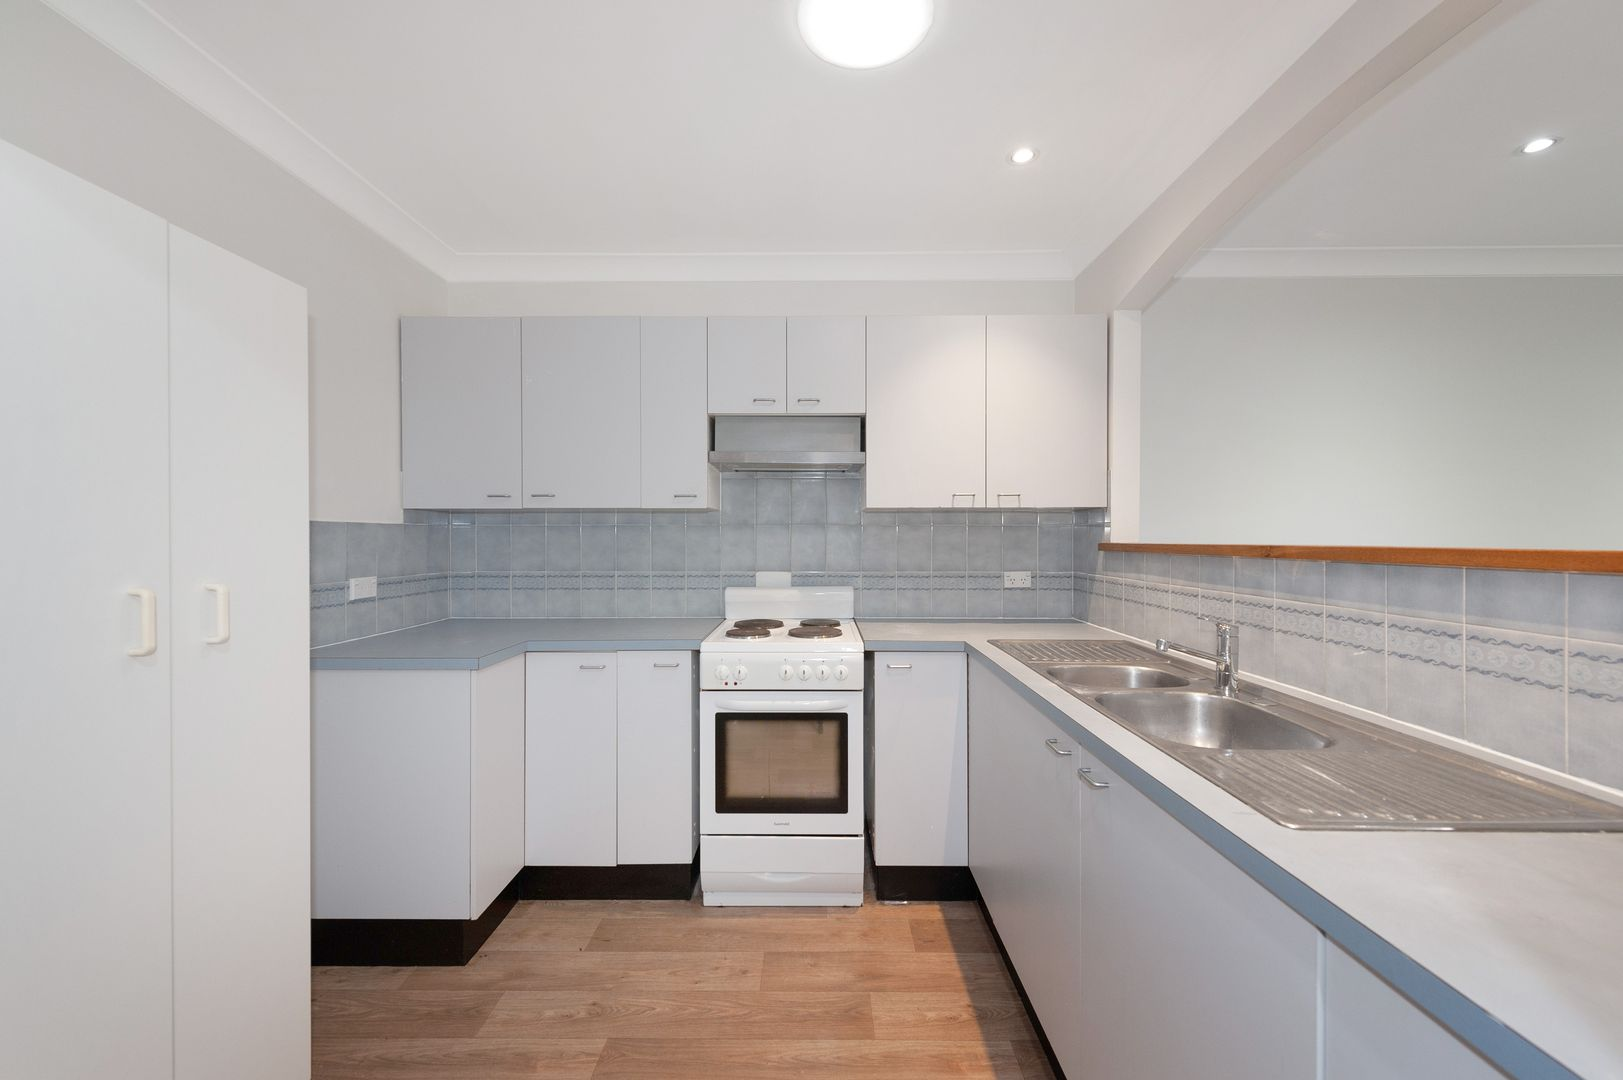 1/12 Jinalee Crescent, Port Macquarie NSW 2444, Image 1